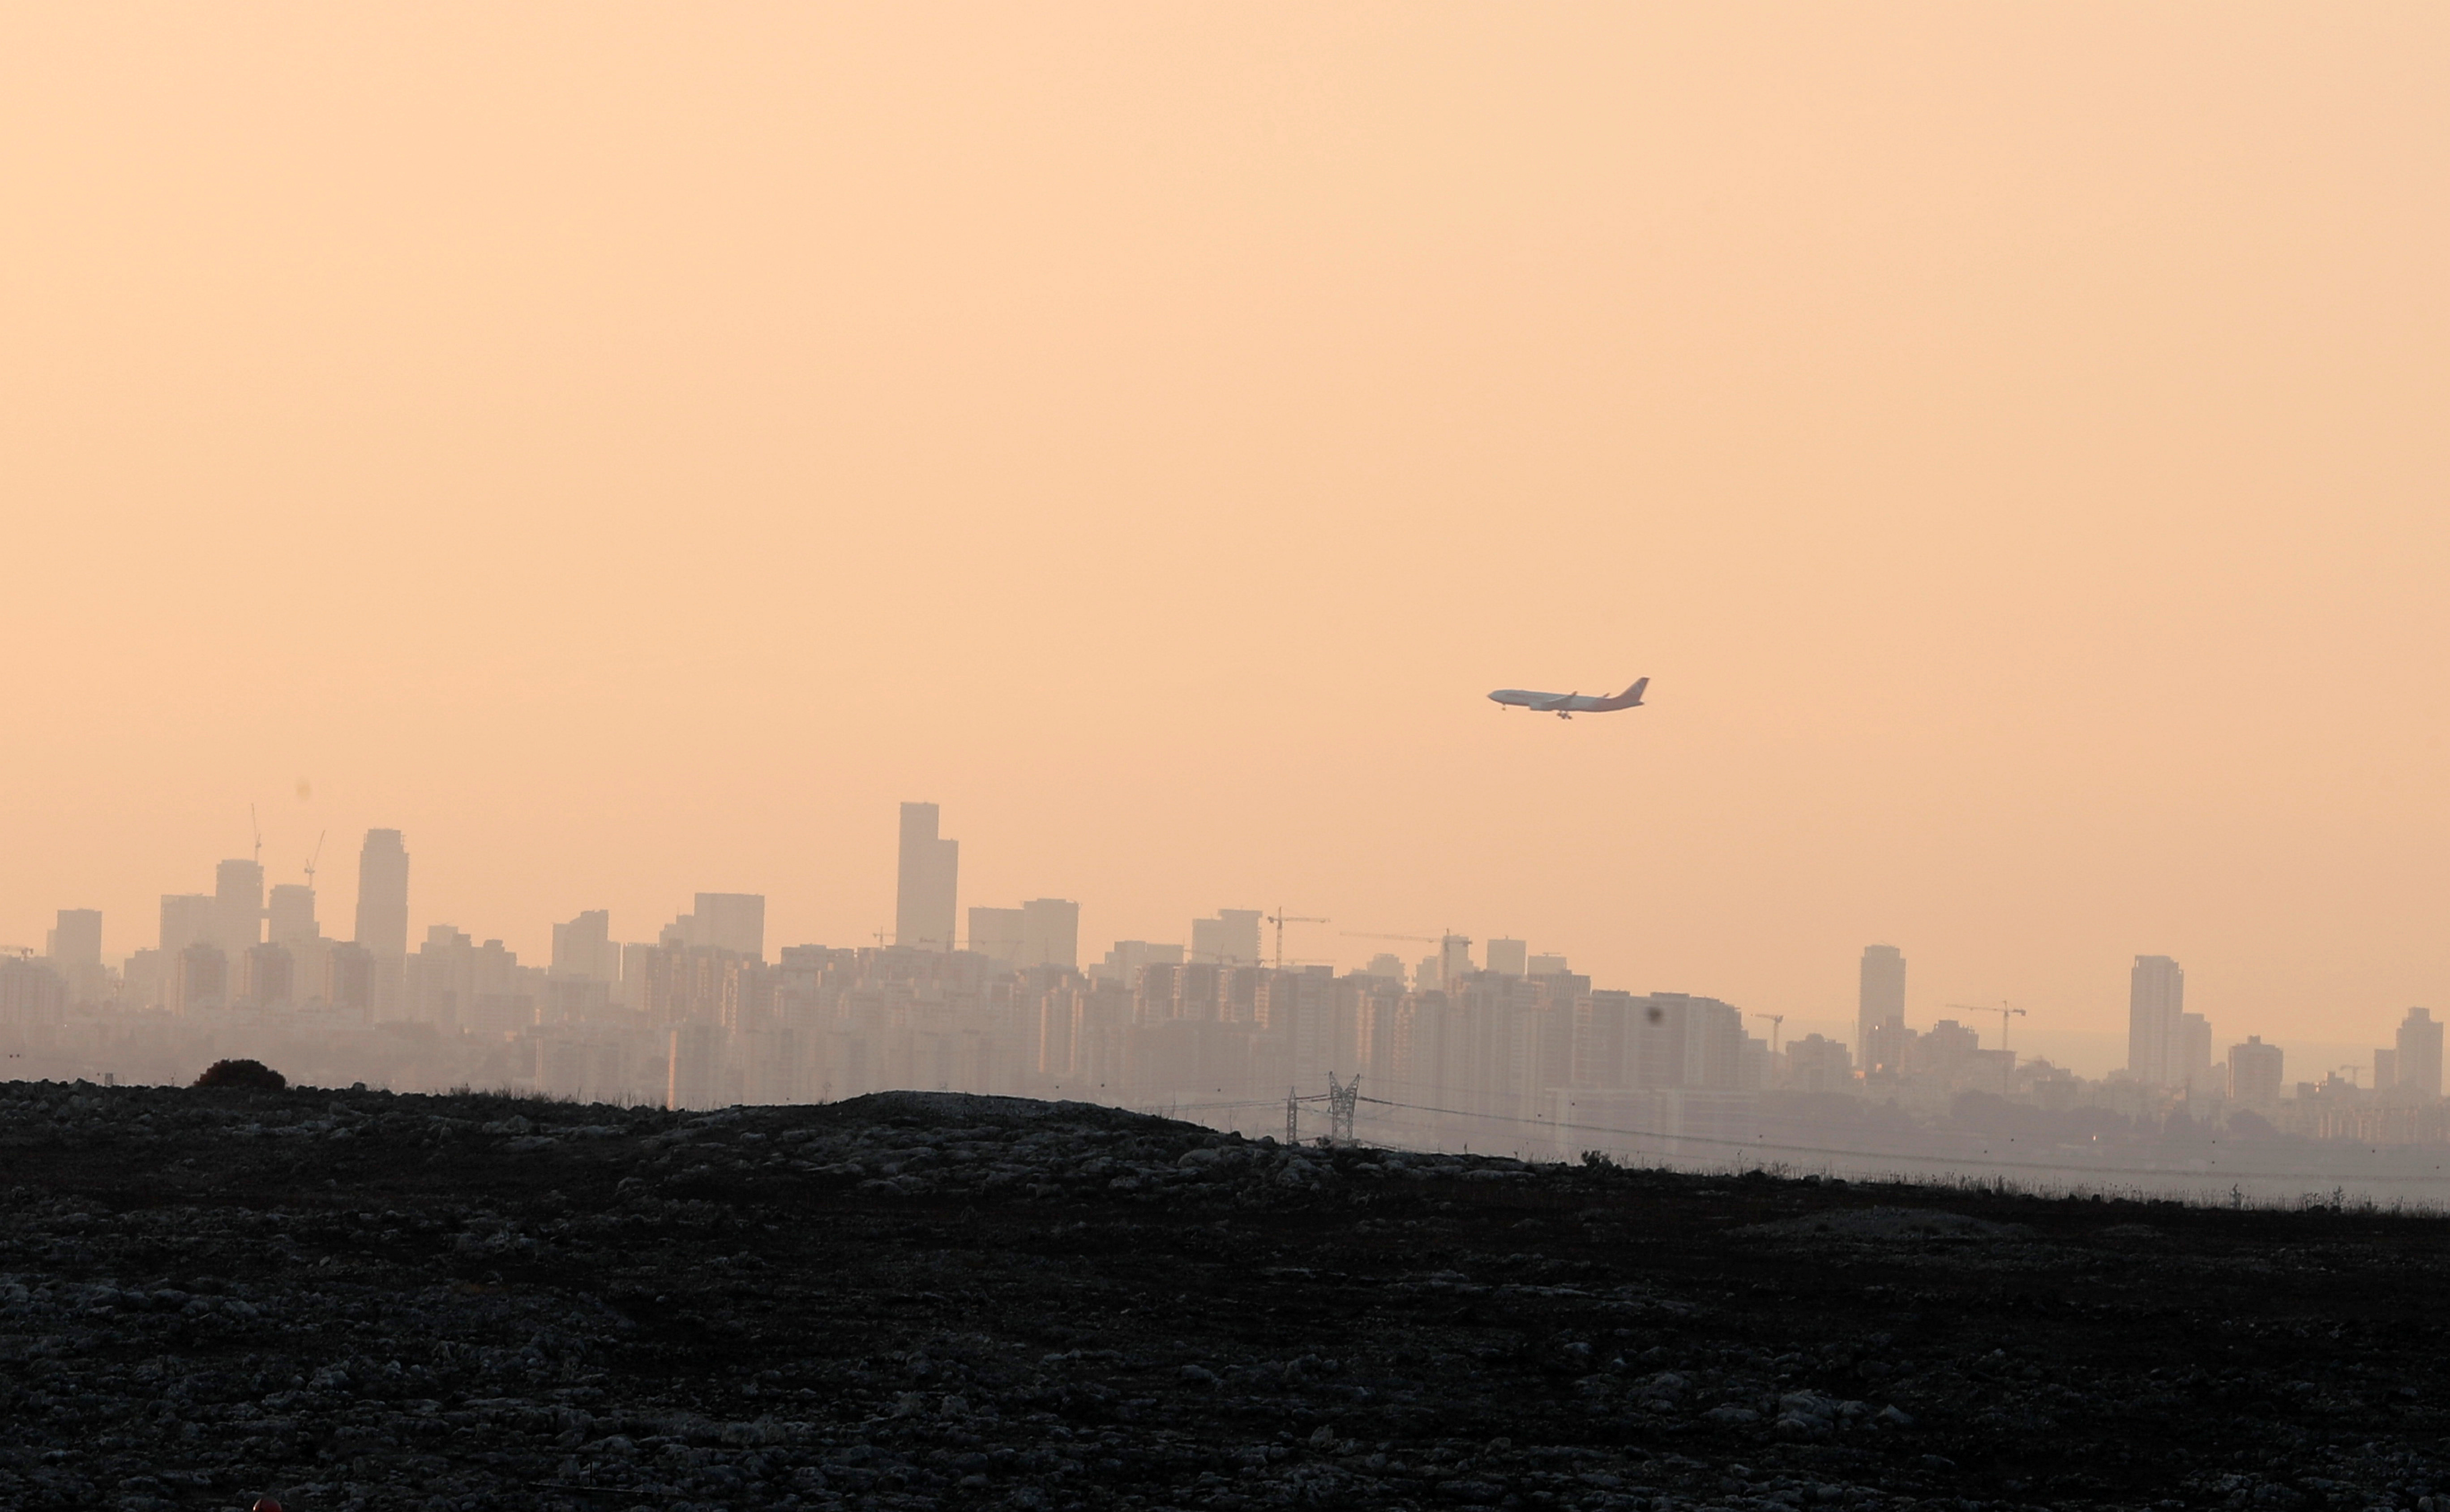 A general view of the urban landscape of Tel Aviv, Israel October 2, 2019. REUTERS/Ammar Awad